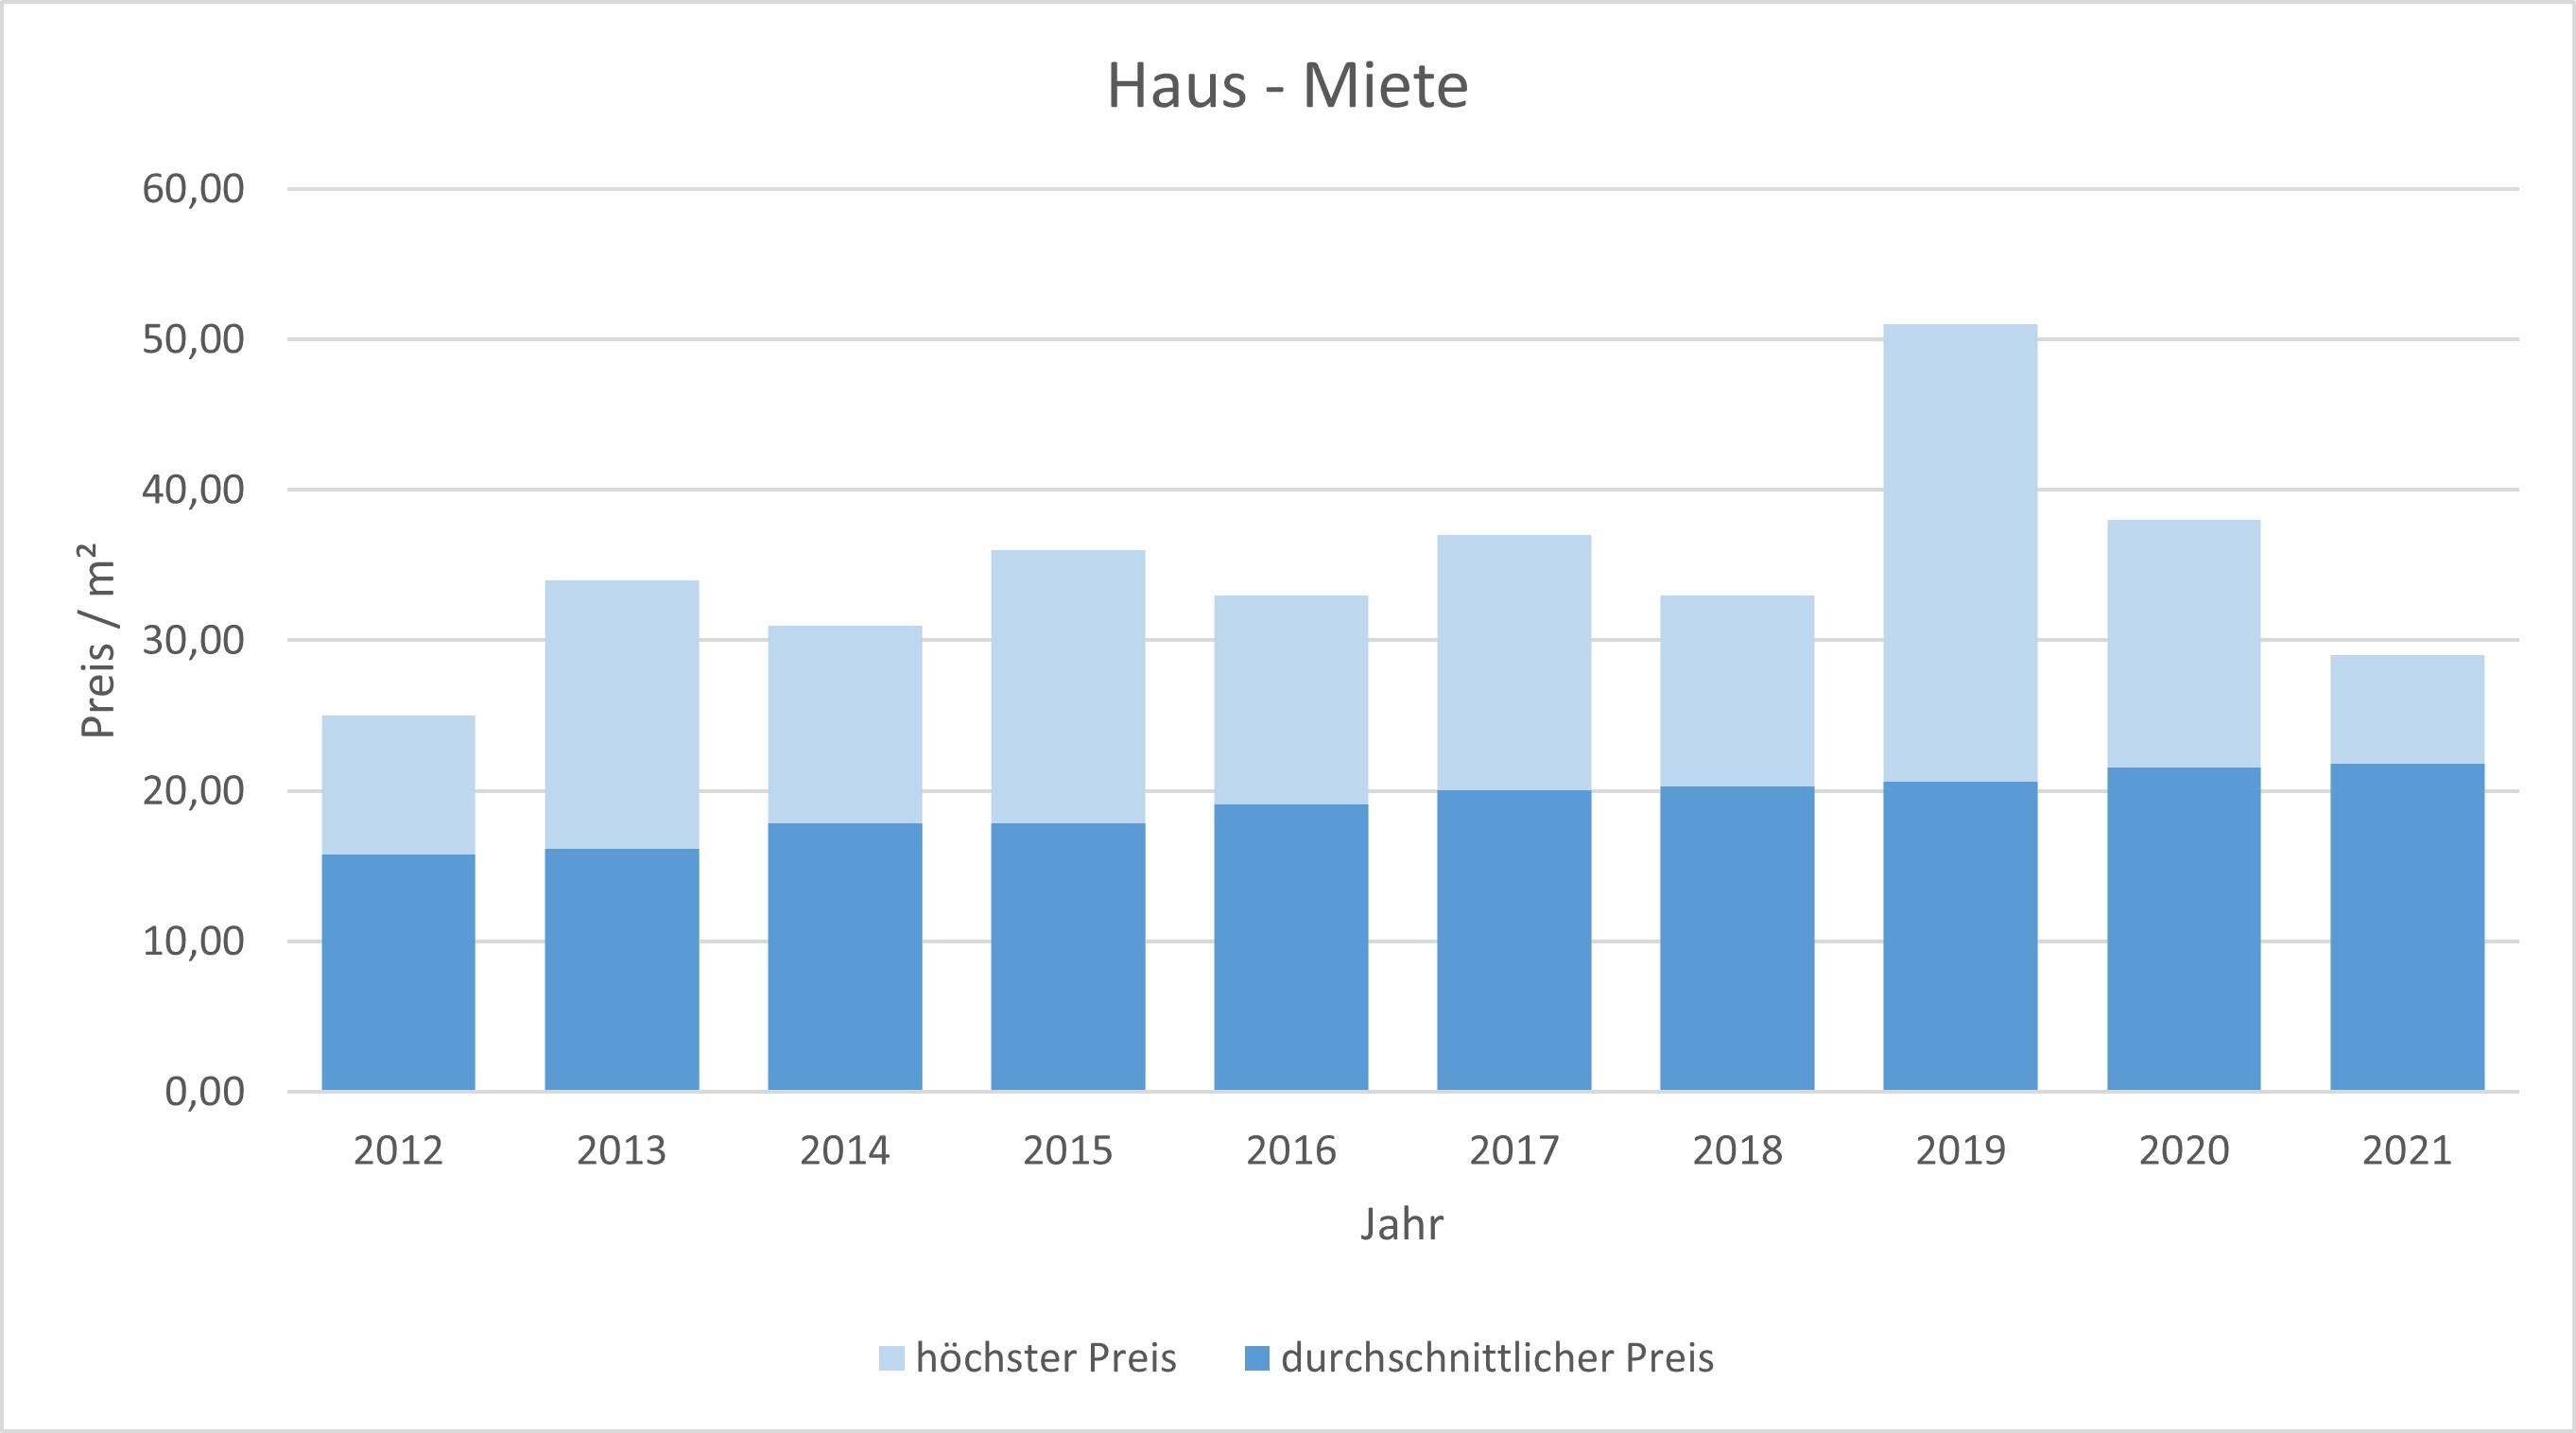 München - Bogenhausen Haus mieten vermieten Preis Bewertung Makler 2019 2020 2021 www.happy-immo.de